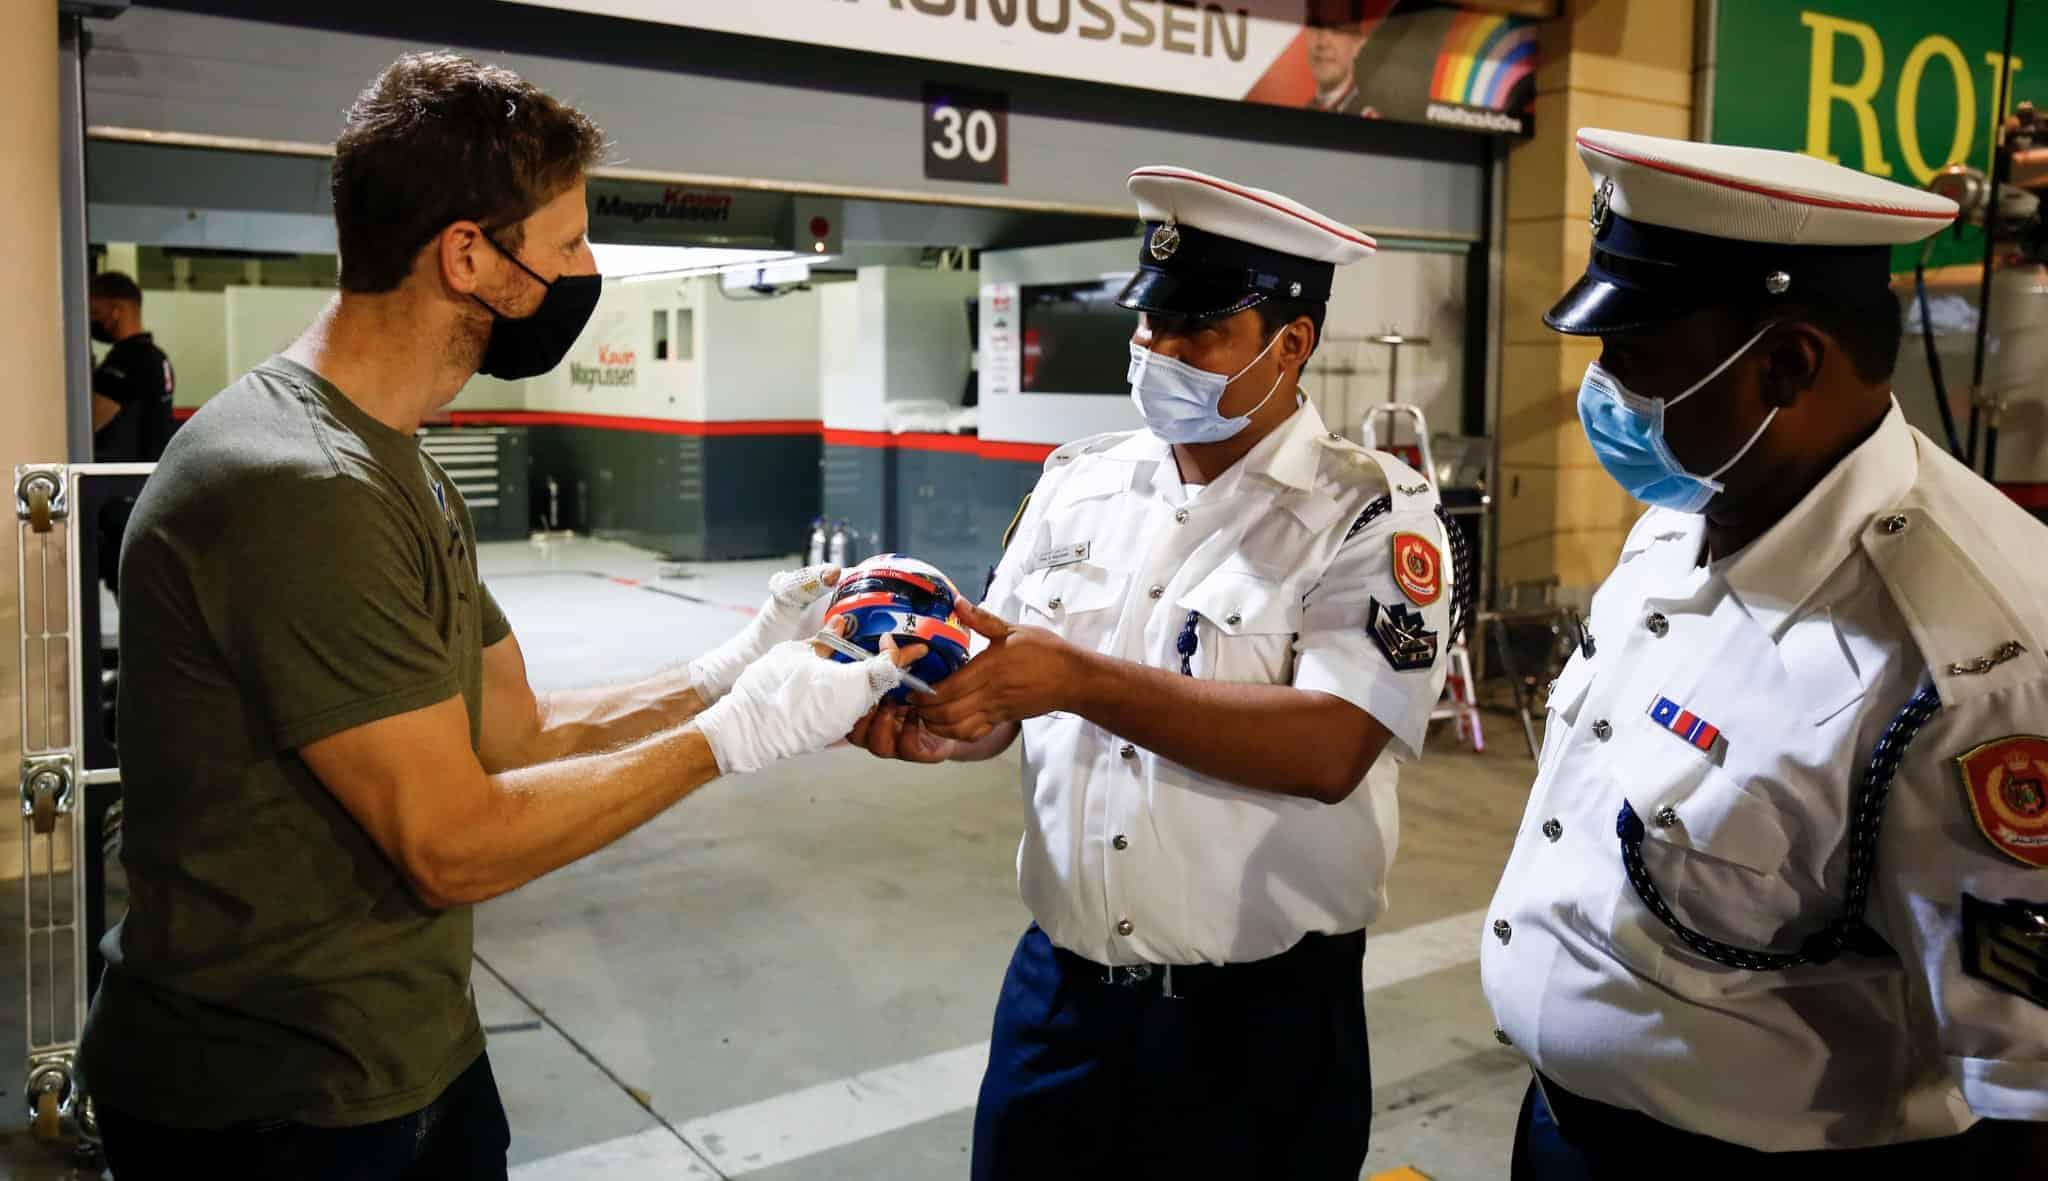 Grosjean thanks firefighters for saving his life Bahrain GP F1 2020 Photo Haas F1 Team